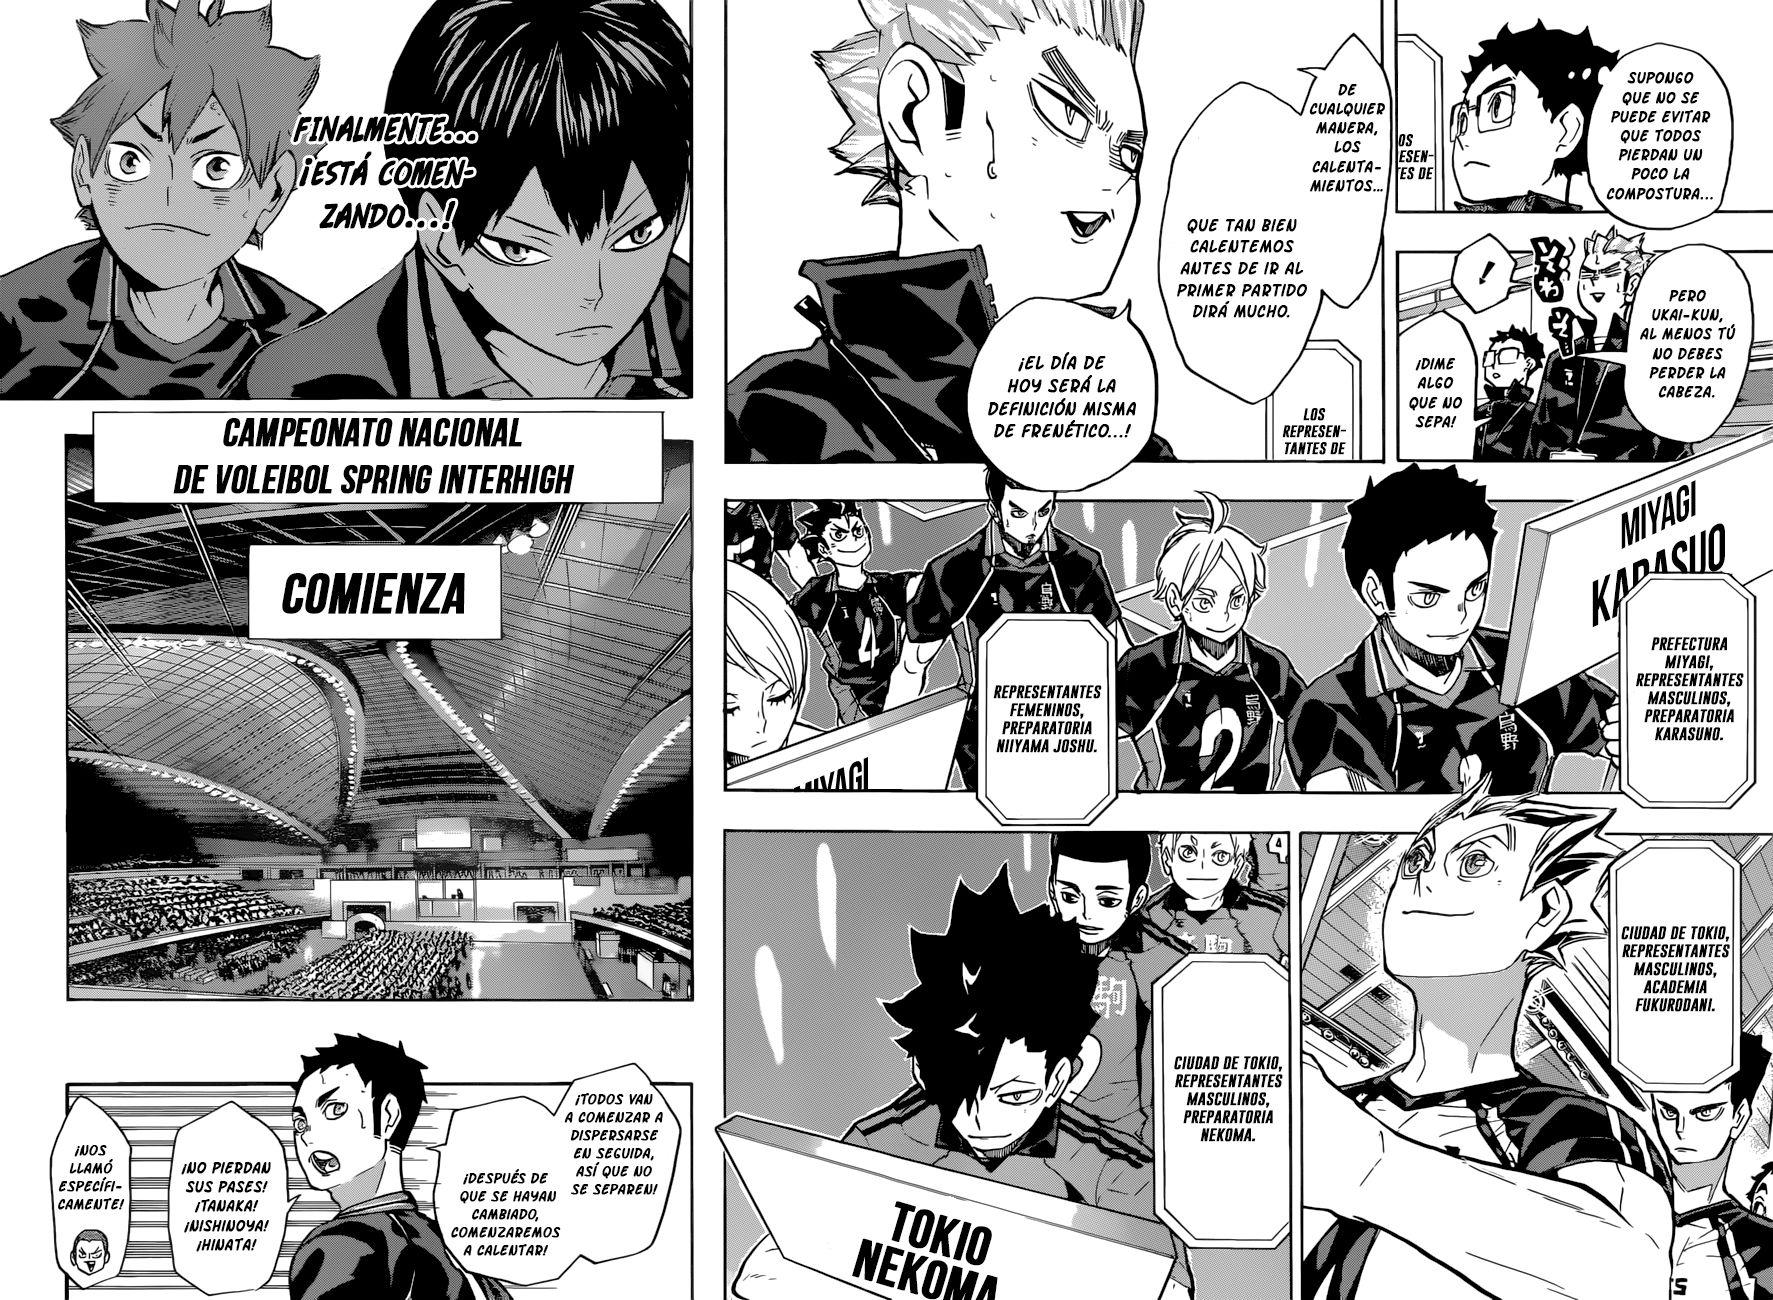 http://c5.ninemanga.com/es_manga/pic2/10/10/518224/1c73b5ac340119713cc76226aa147eaf.jpg Page 10